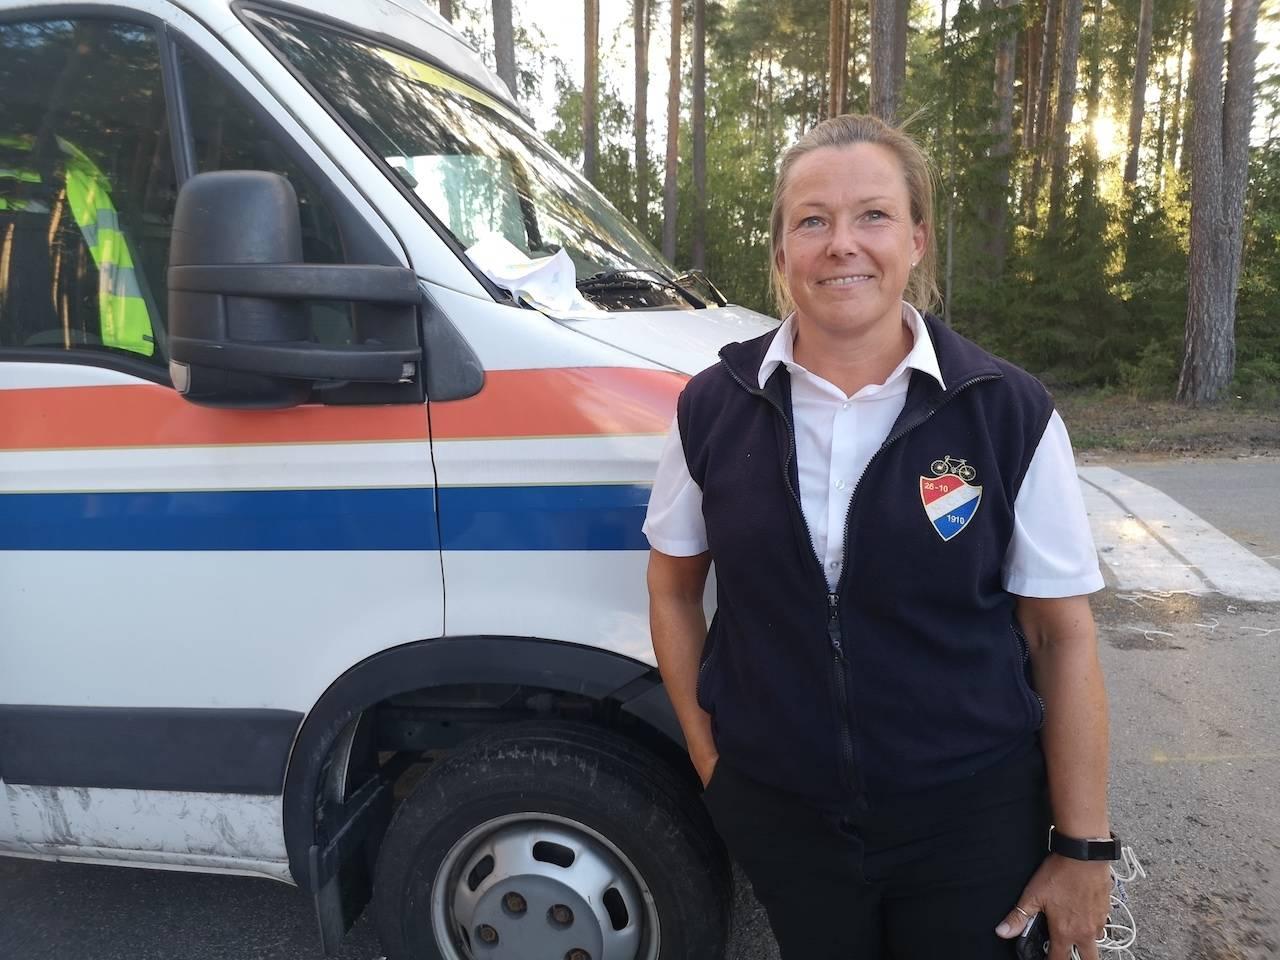 ENDELIG: Sjefskommisær under NM, Heidi Stenbock-Haakestad. Foto: Henrik Alpers.